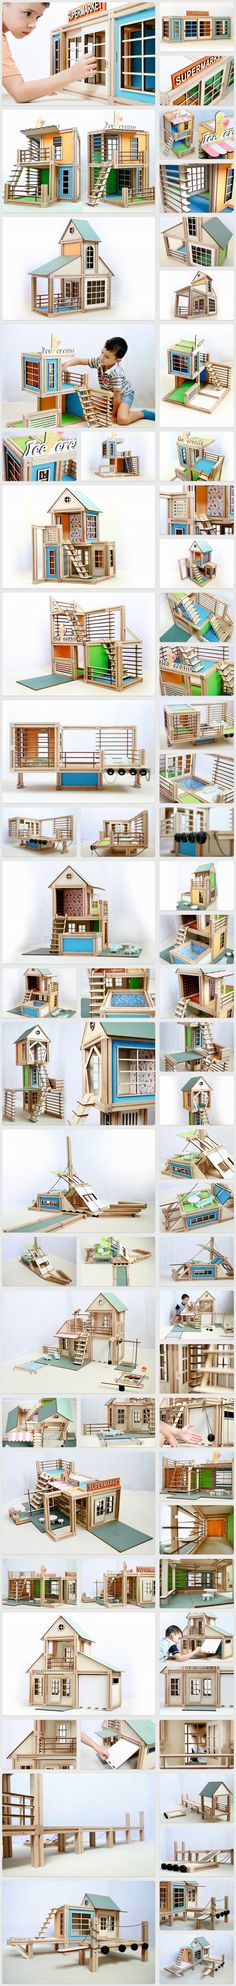 WoodyMac - Magnetic Building Blocks (Canceled) by WoodyMac, Inc. — Kickstarter